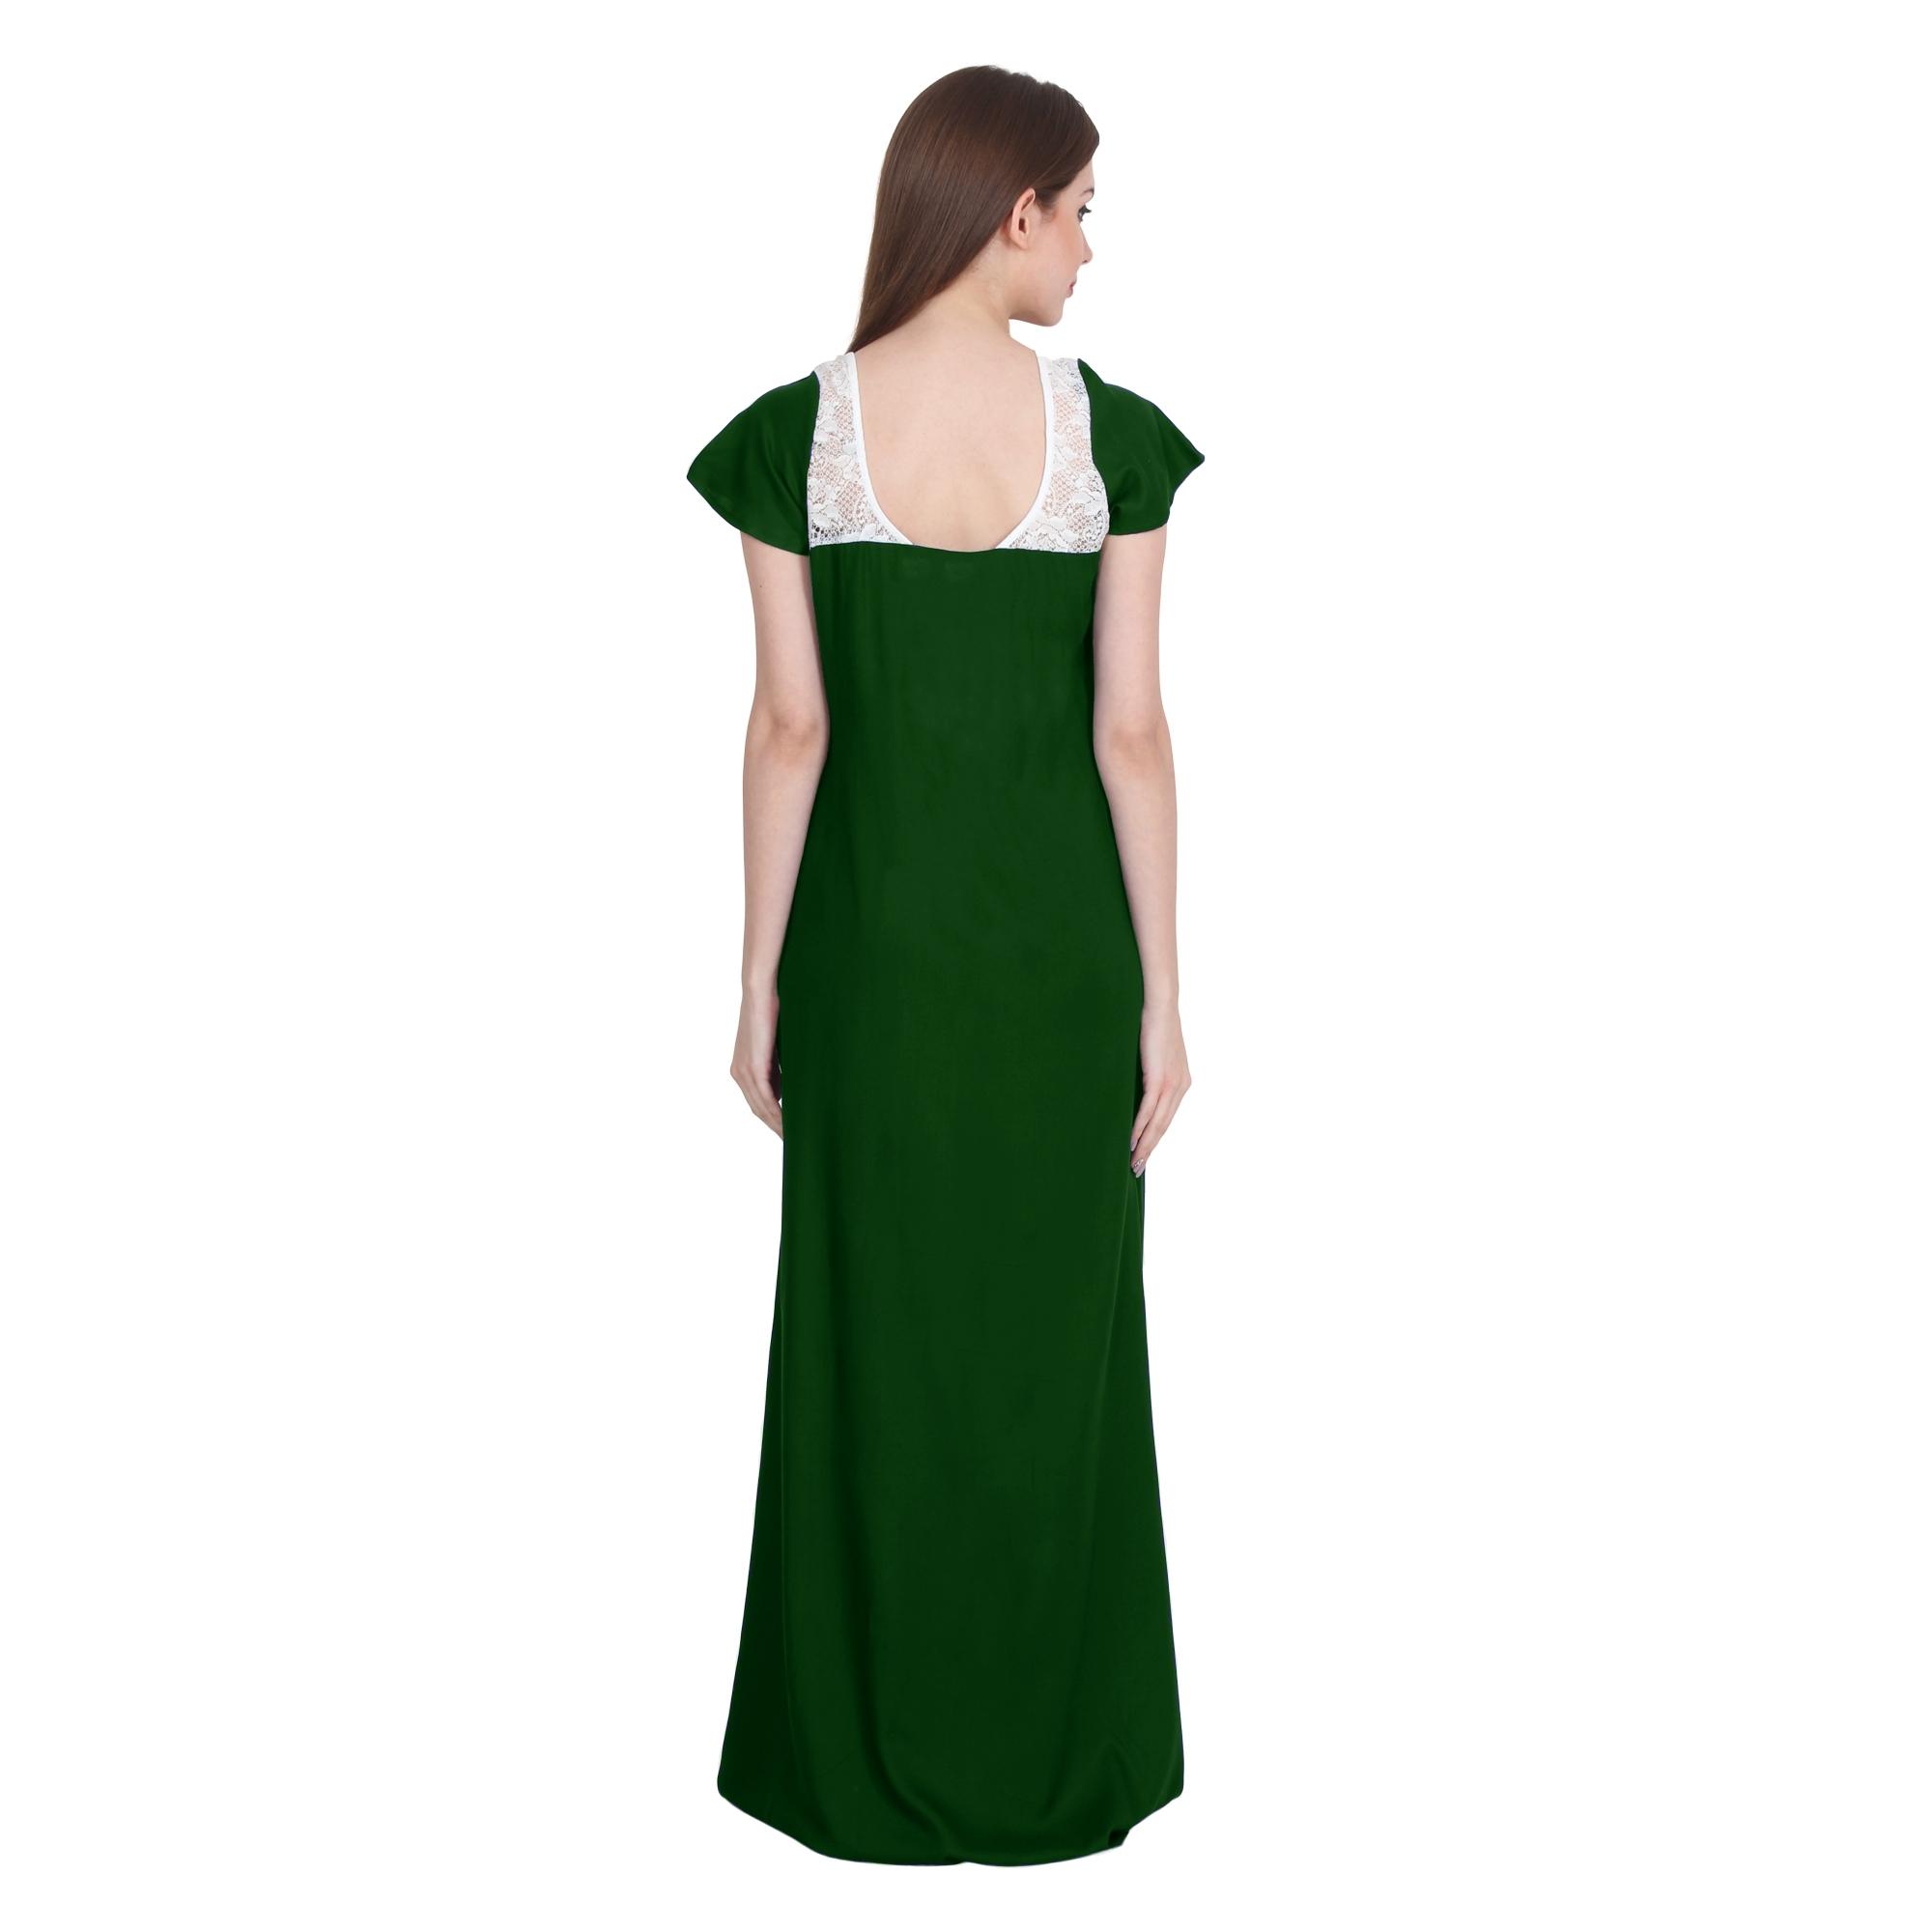 Lace Bodice Cap Sleeve Maxi Length Nighty in Bottle Green